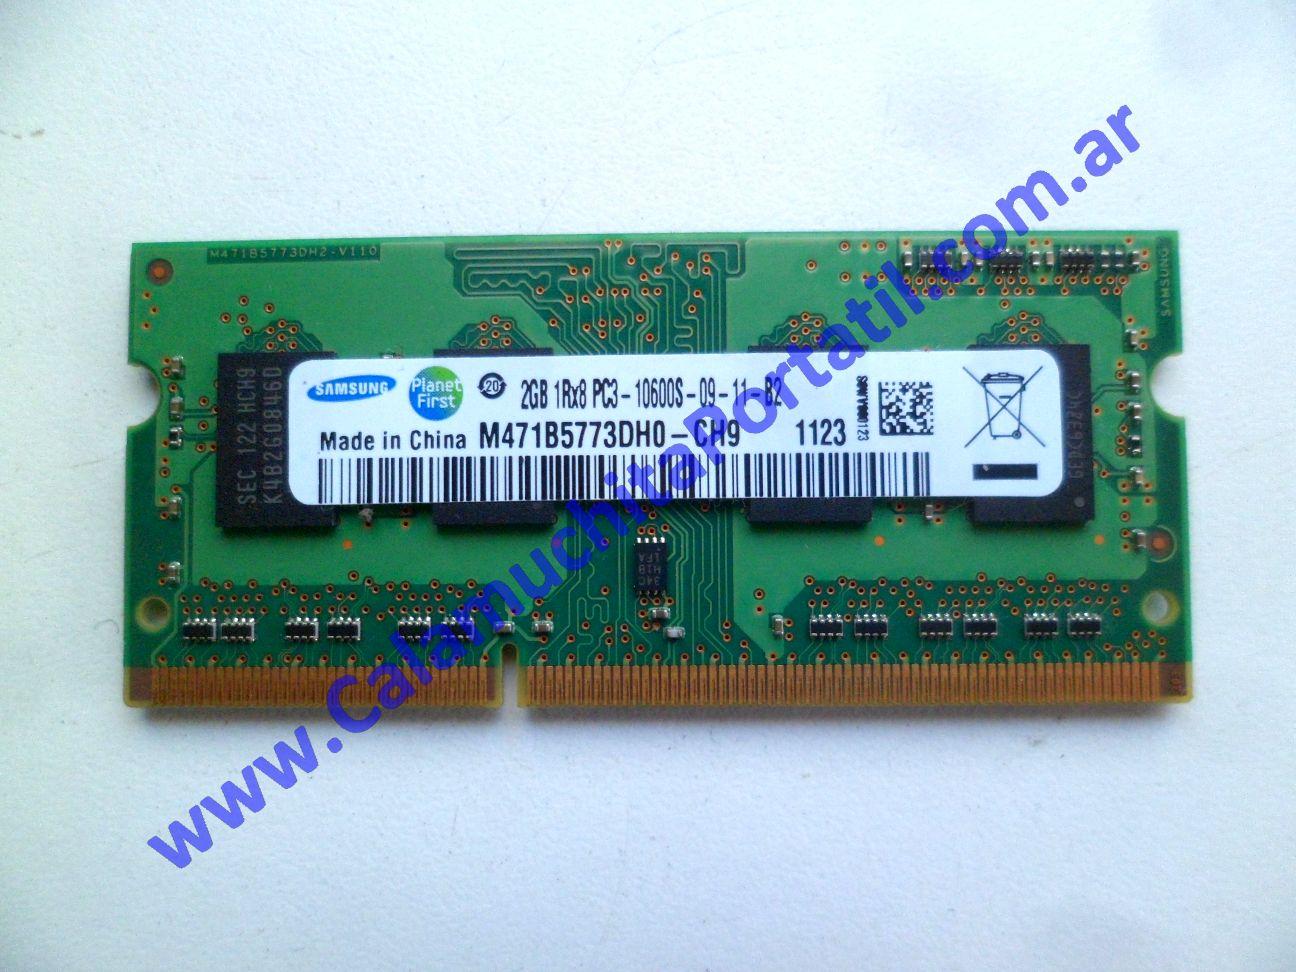 0598NMB Memoria Toshiba Satellite L755-S5275 / PSK1WU-04M004